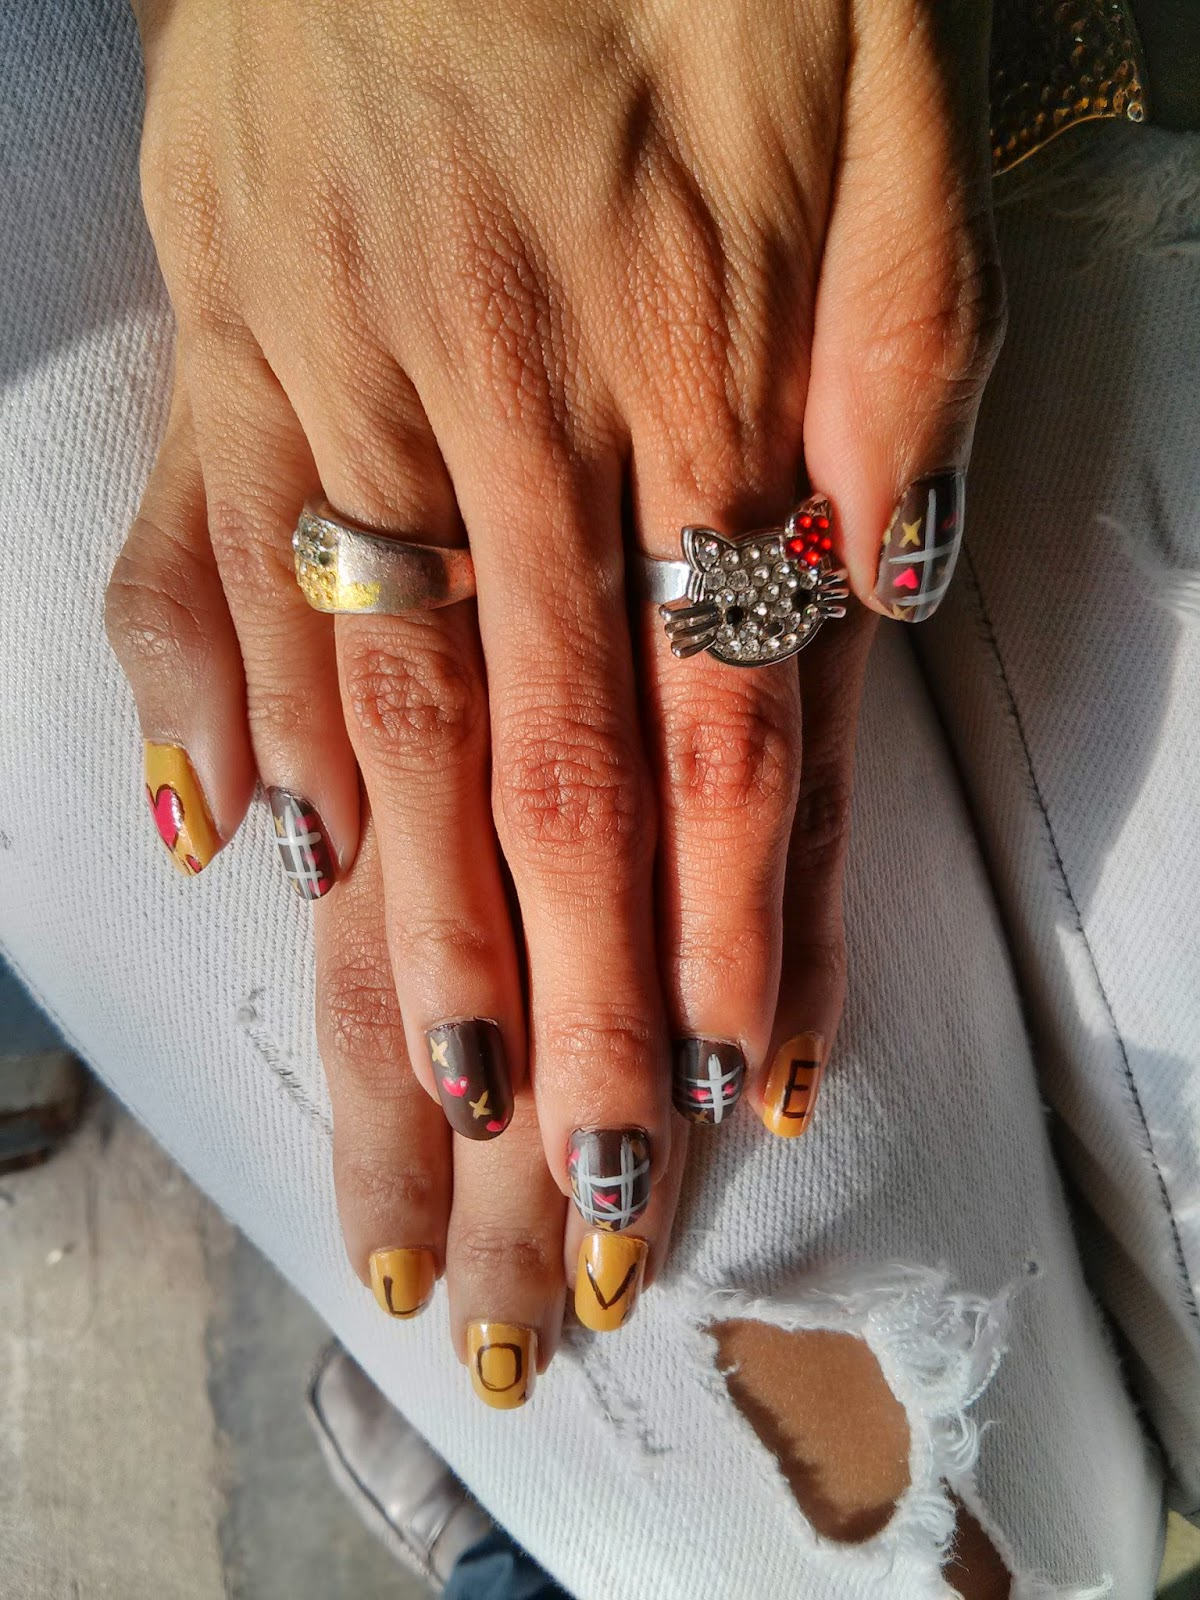 Sweetkitty Nailsmakeup Scrabble Y La Vieja Love Nail Art